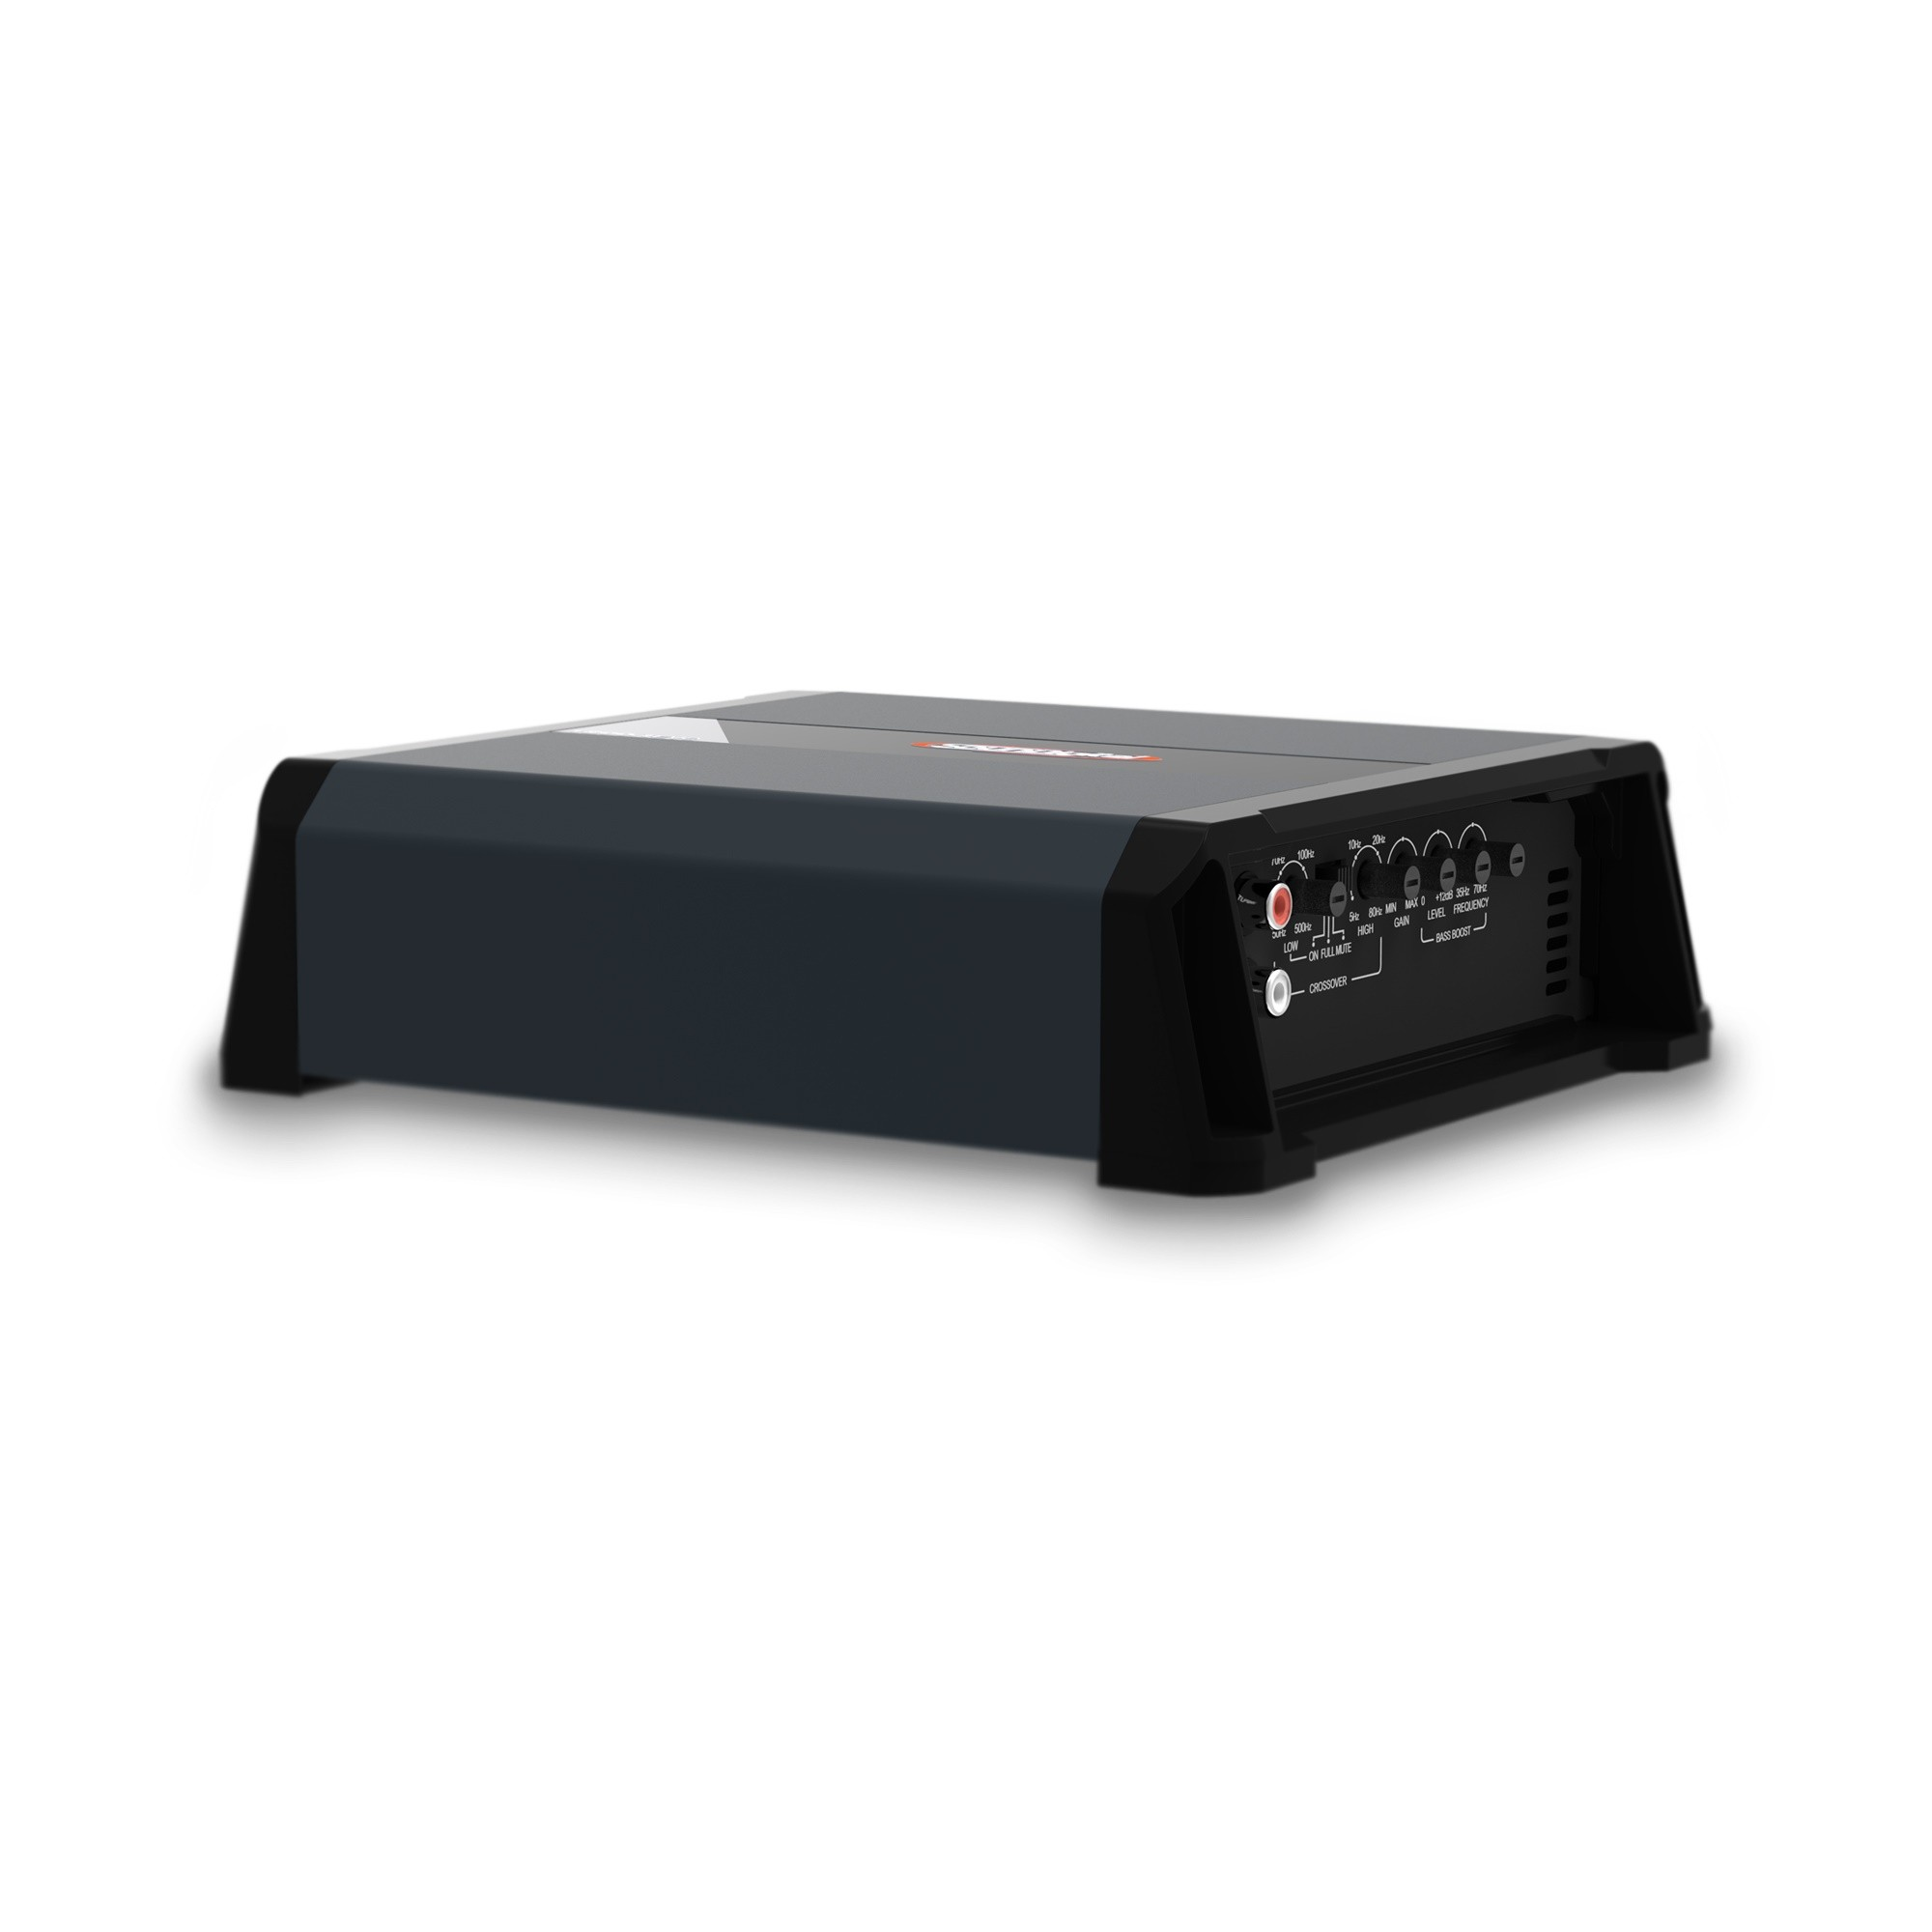 Módulo Amplificador Soundigital SD 1200.1 EVO 4.0 1200W Rms 2 Ohms 1 Canal